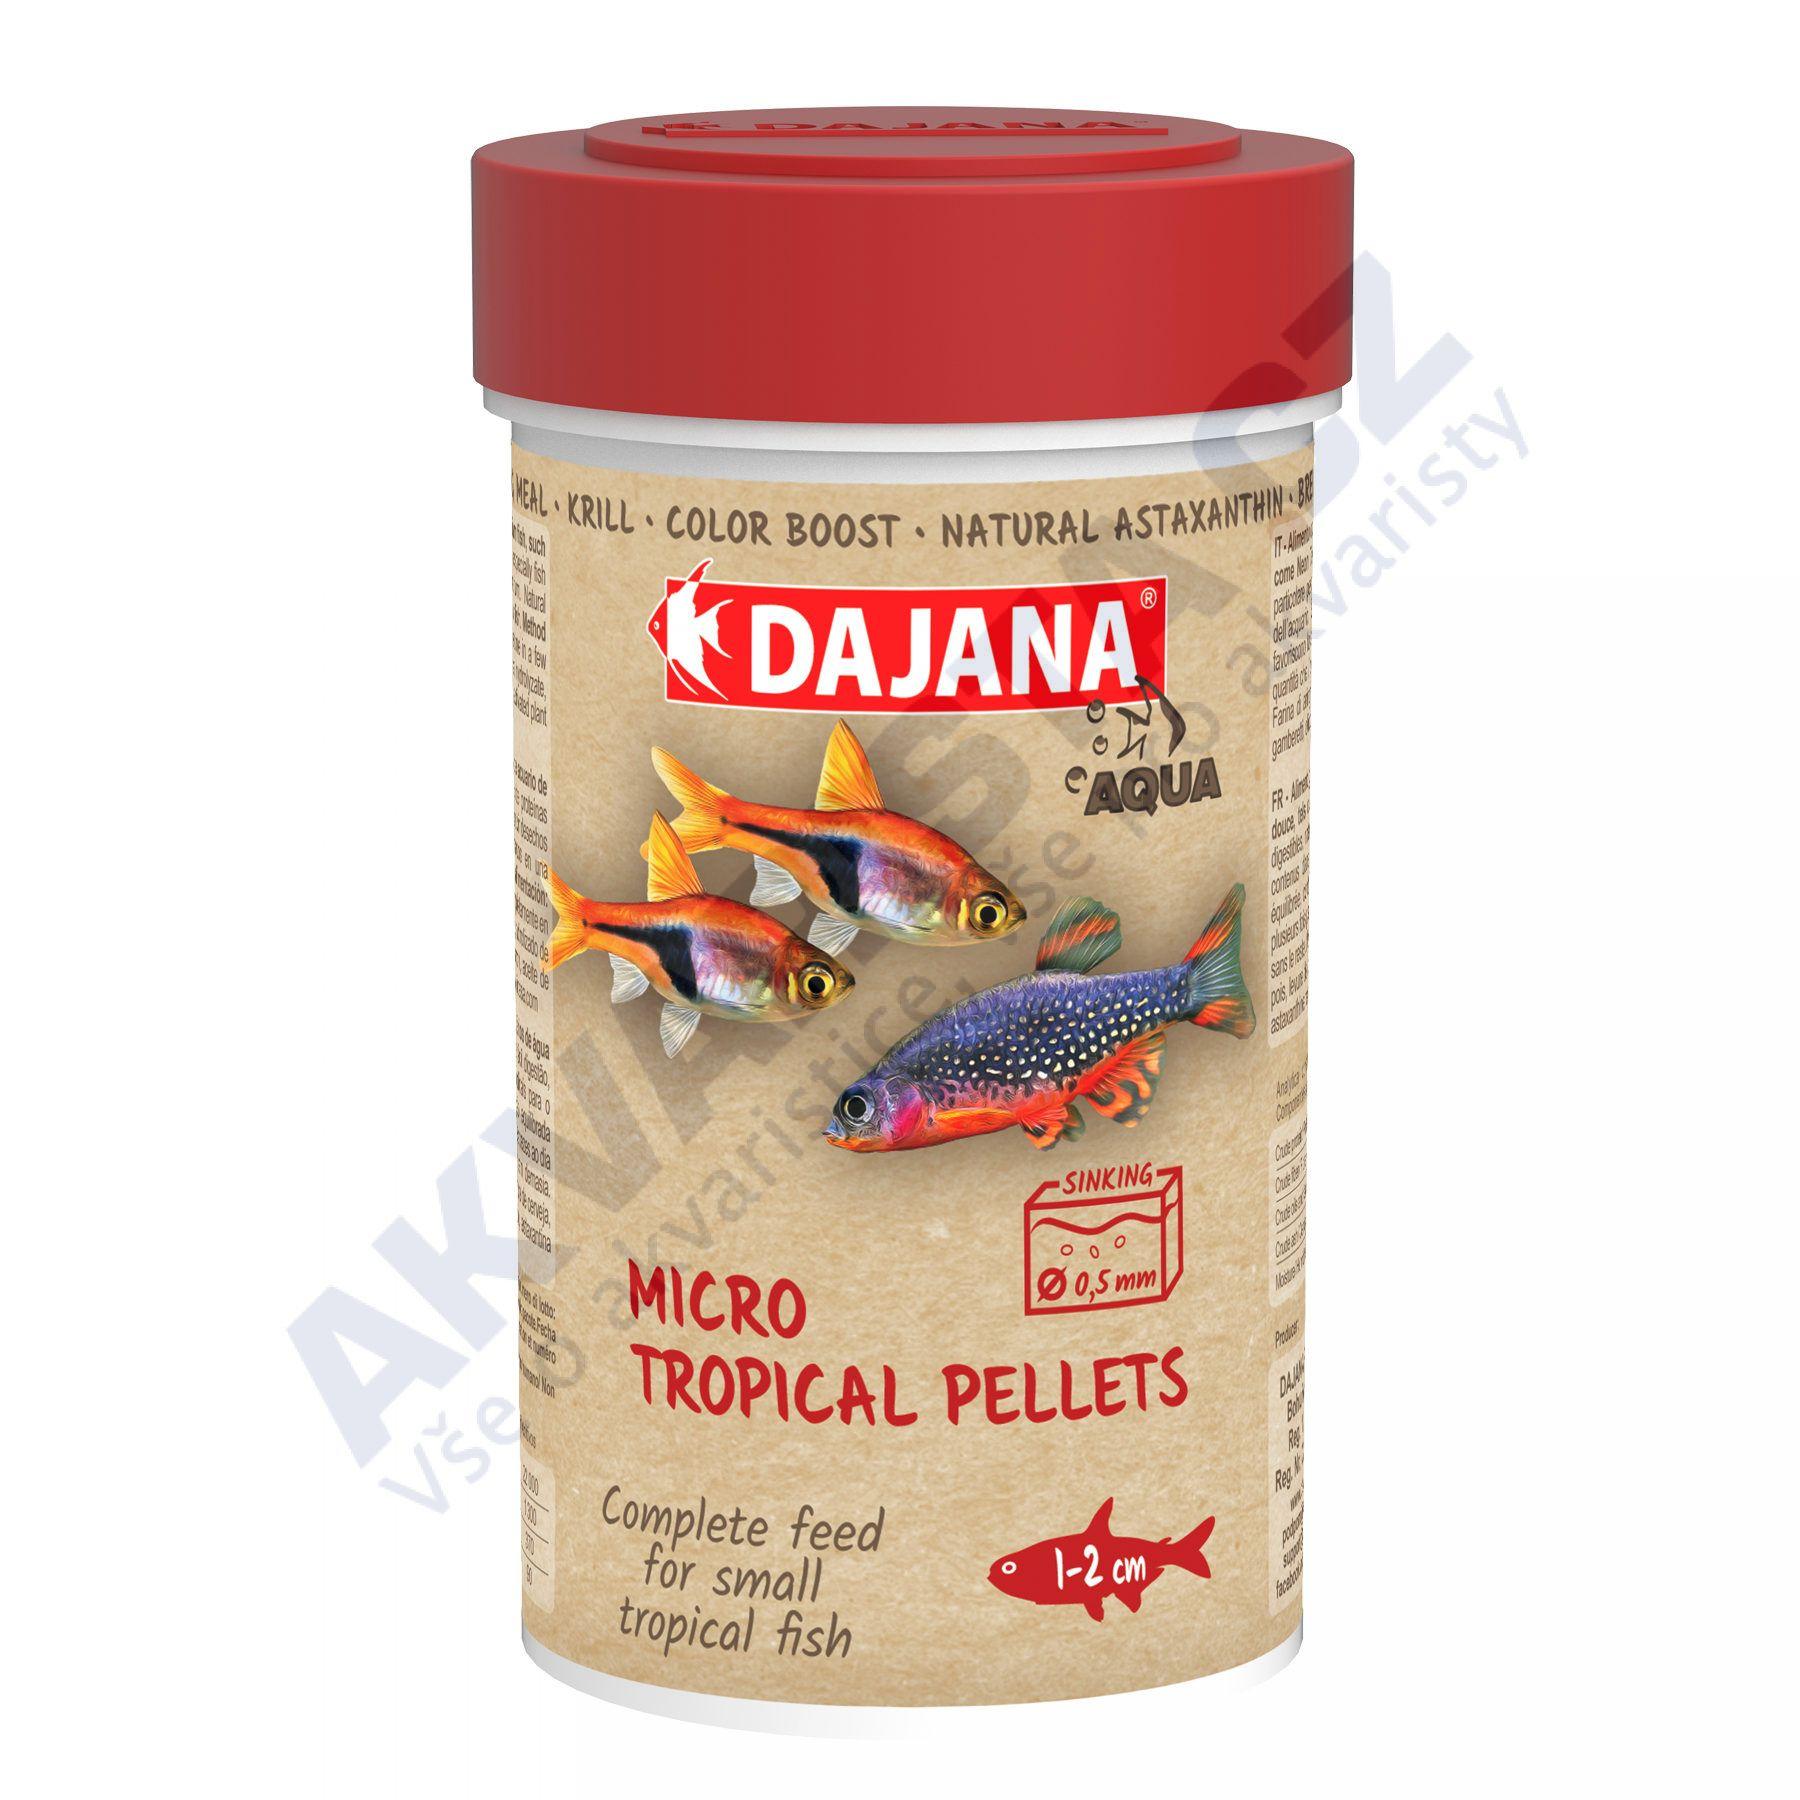 Dajana Neon tetra micro pellets 100ml